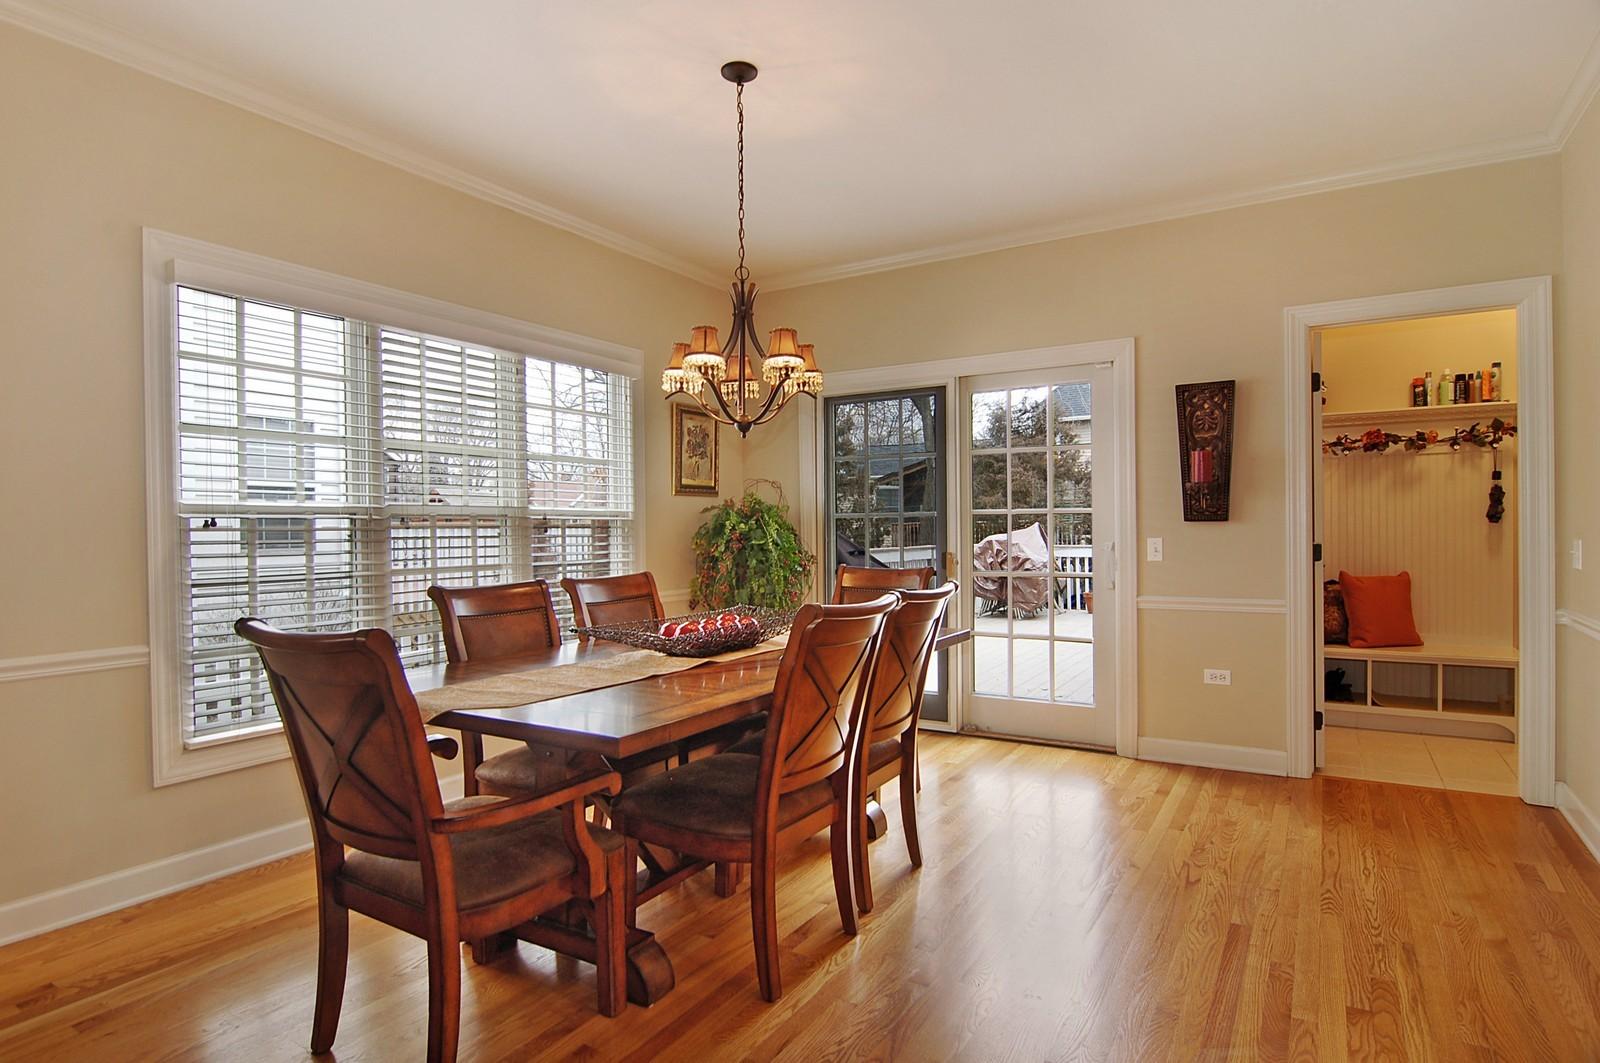 Real Estate Photography - 203 E. Lincoln, Wheaton, IL, 60187 - Kitchen Eating Area